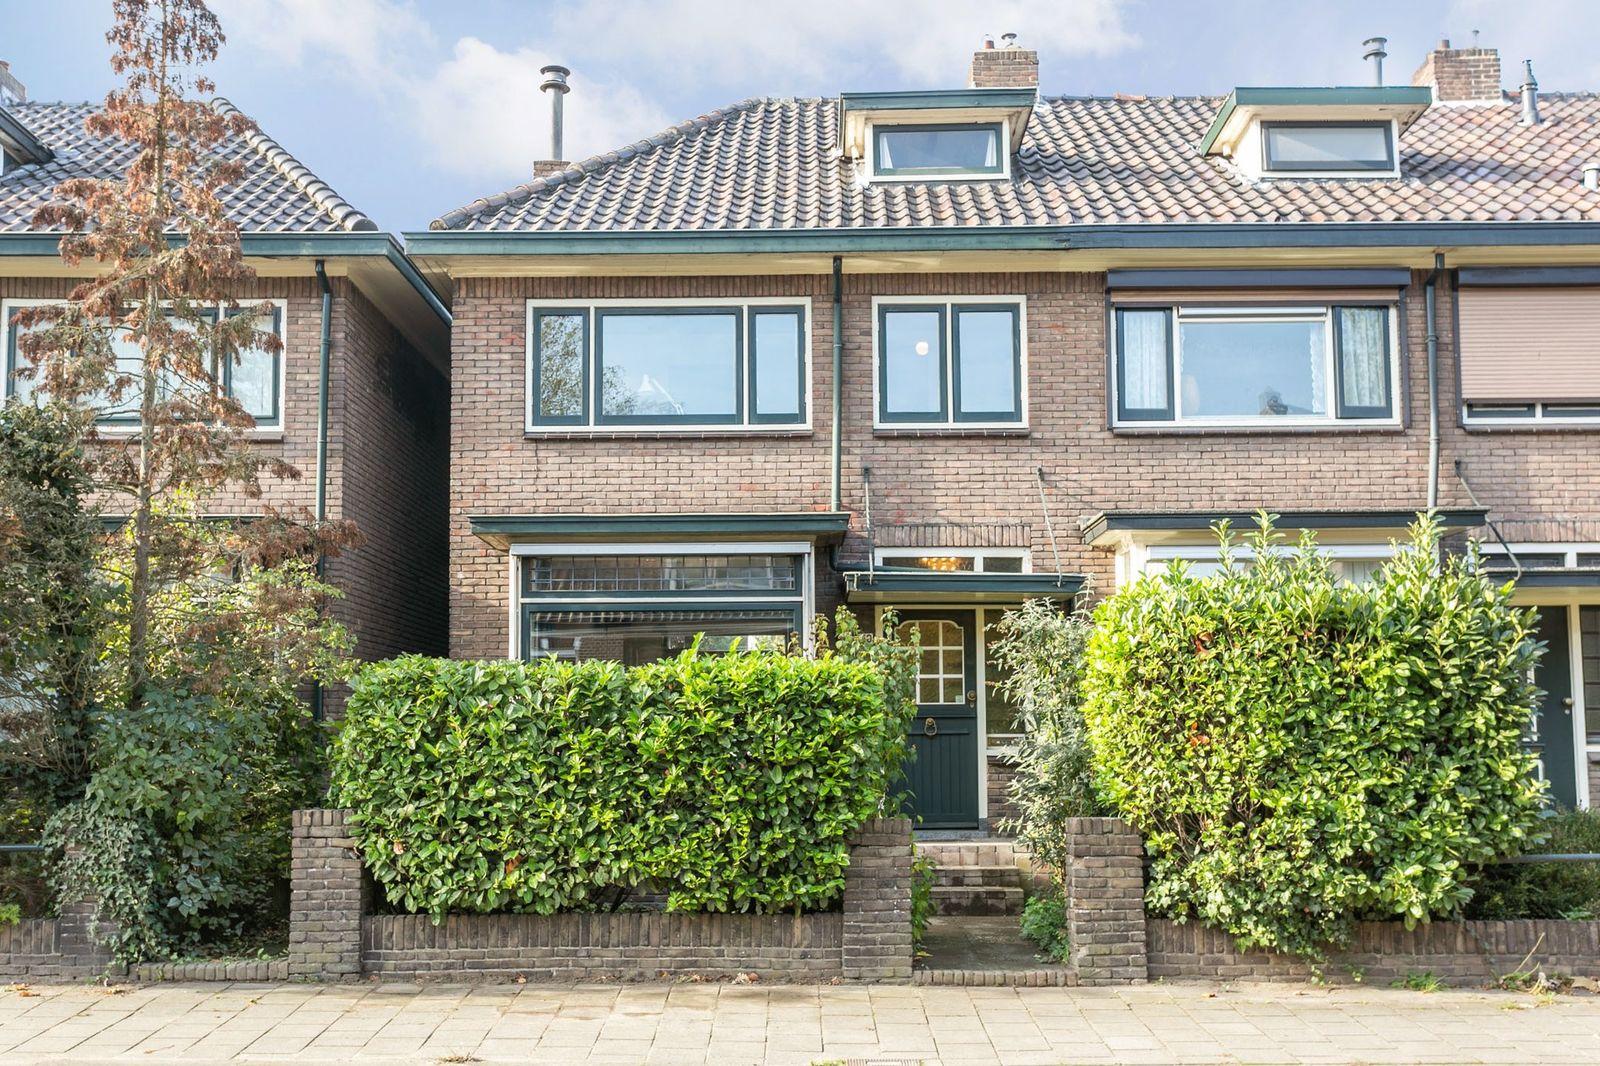 Veenweg 150, Deventer